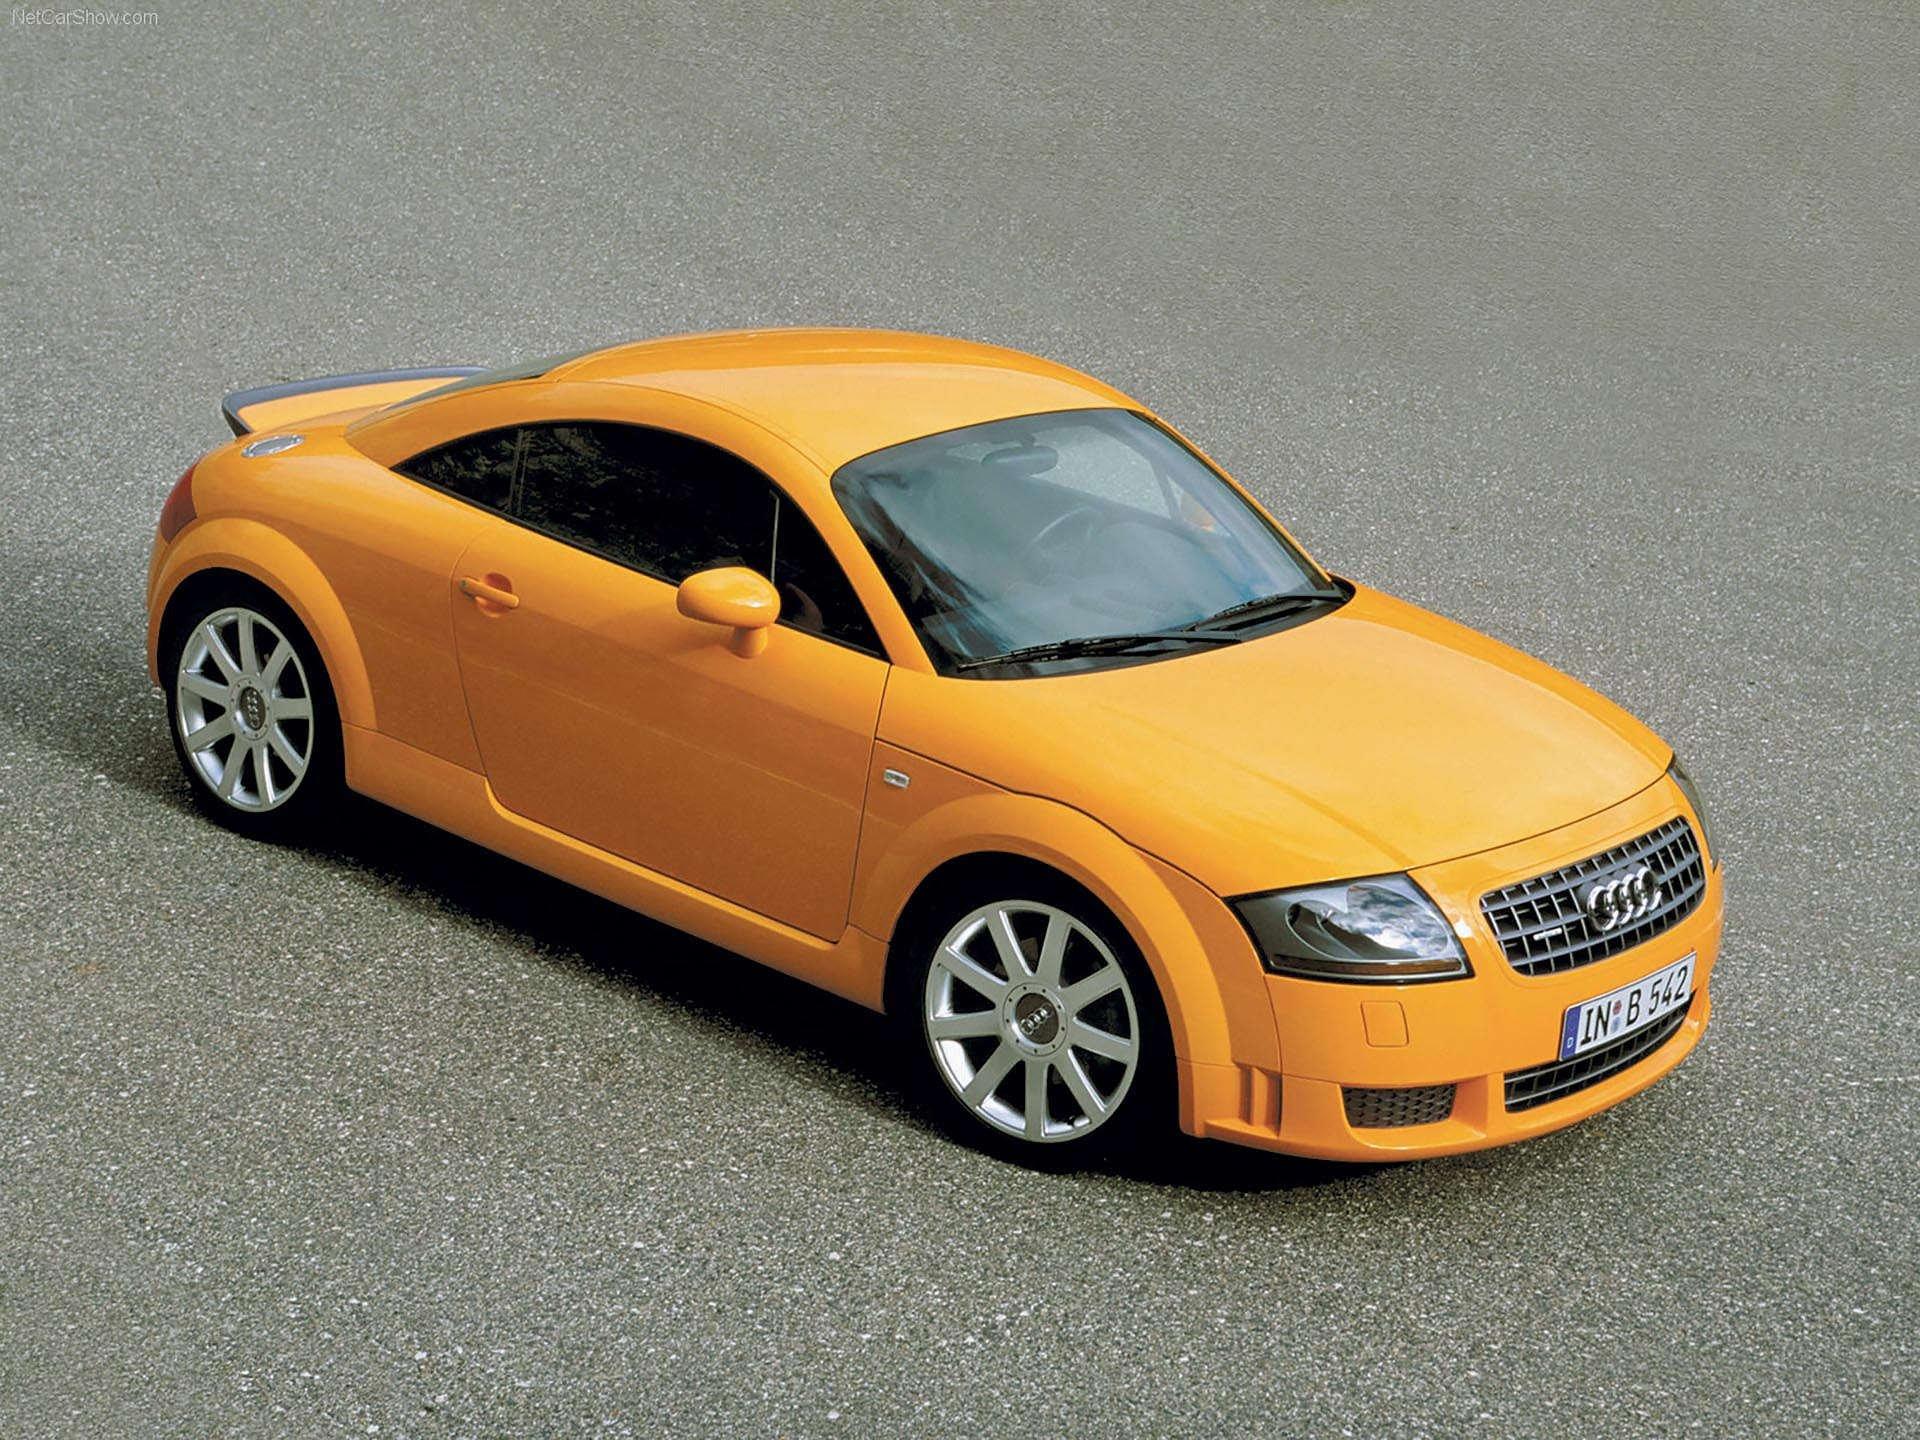 07_Audi TT DSG S Tronic 3.2 Quattro VR6